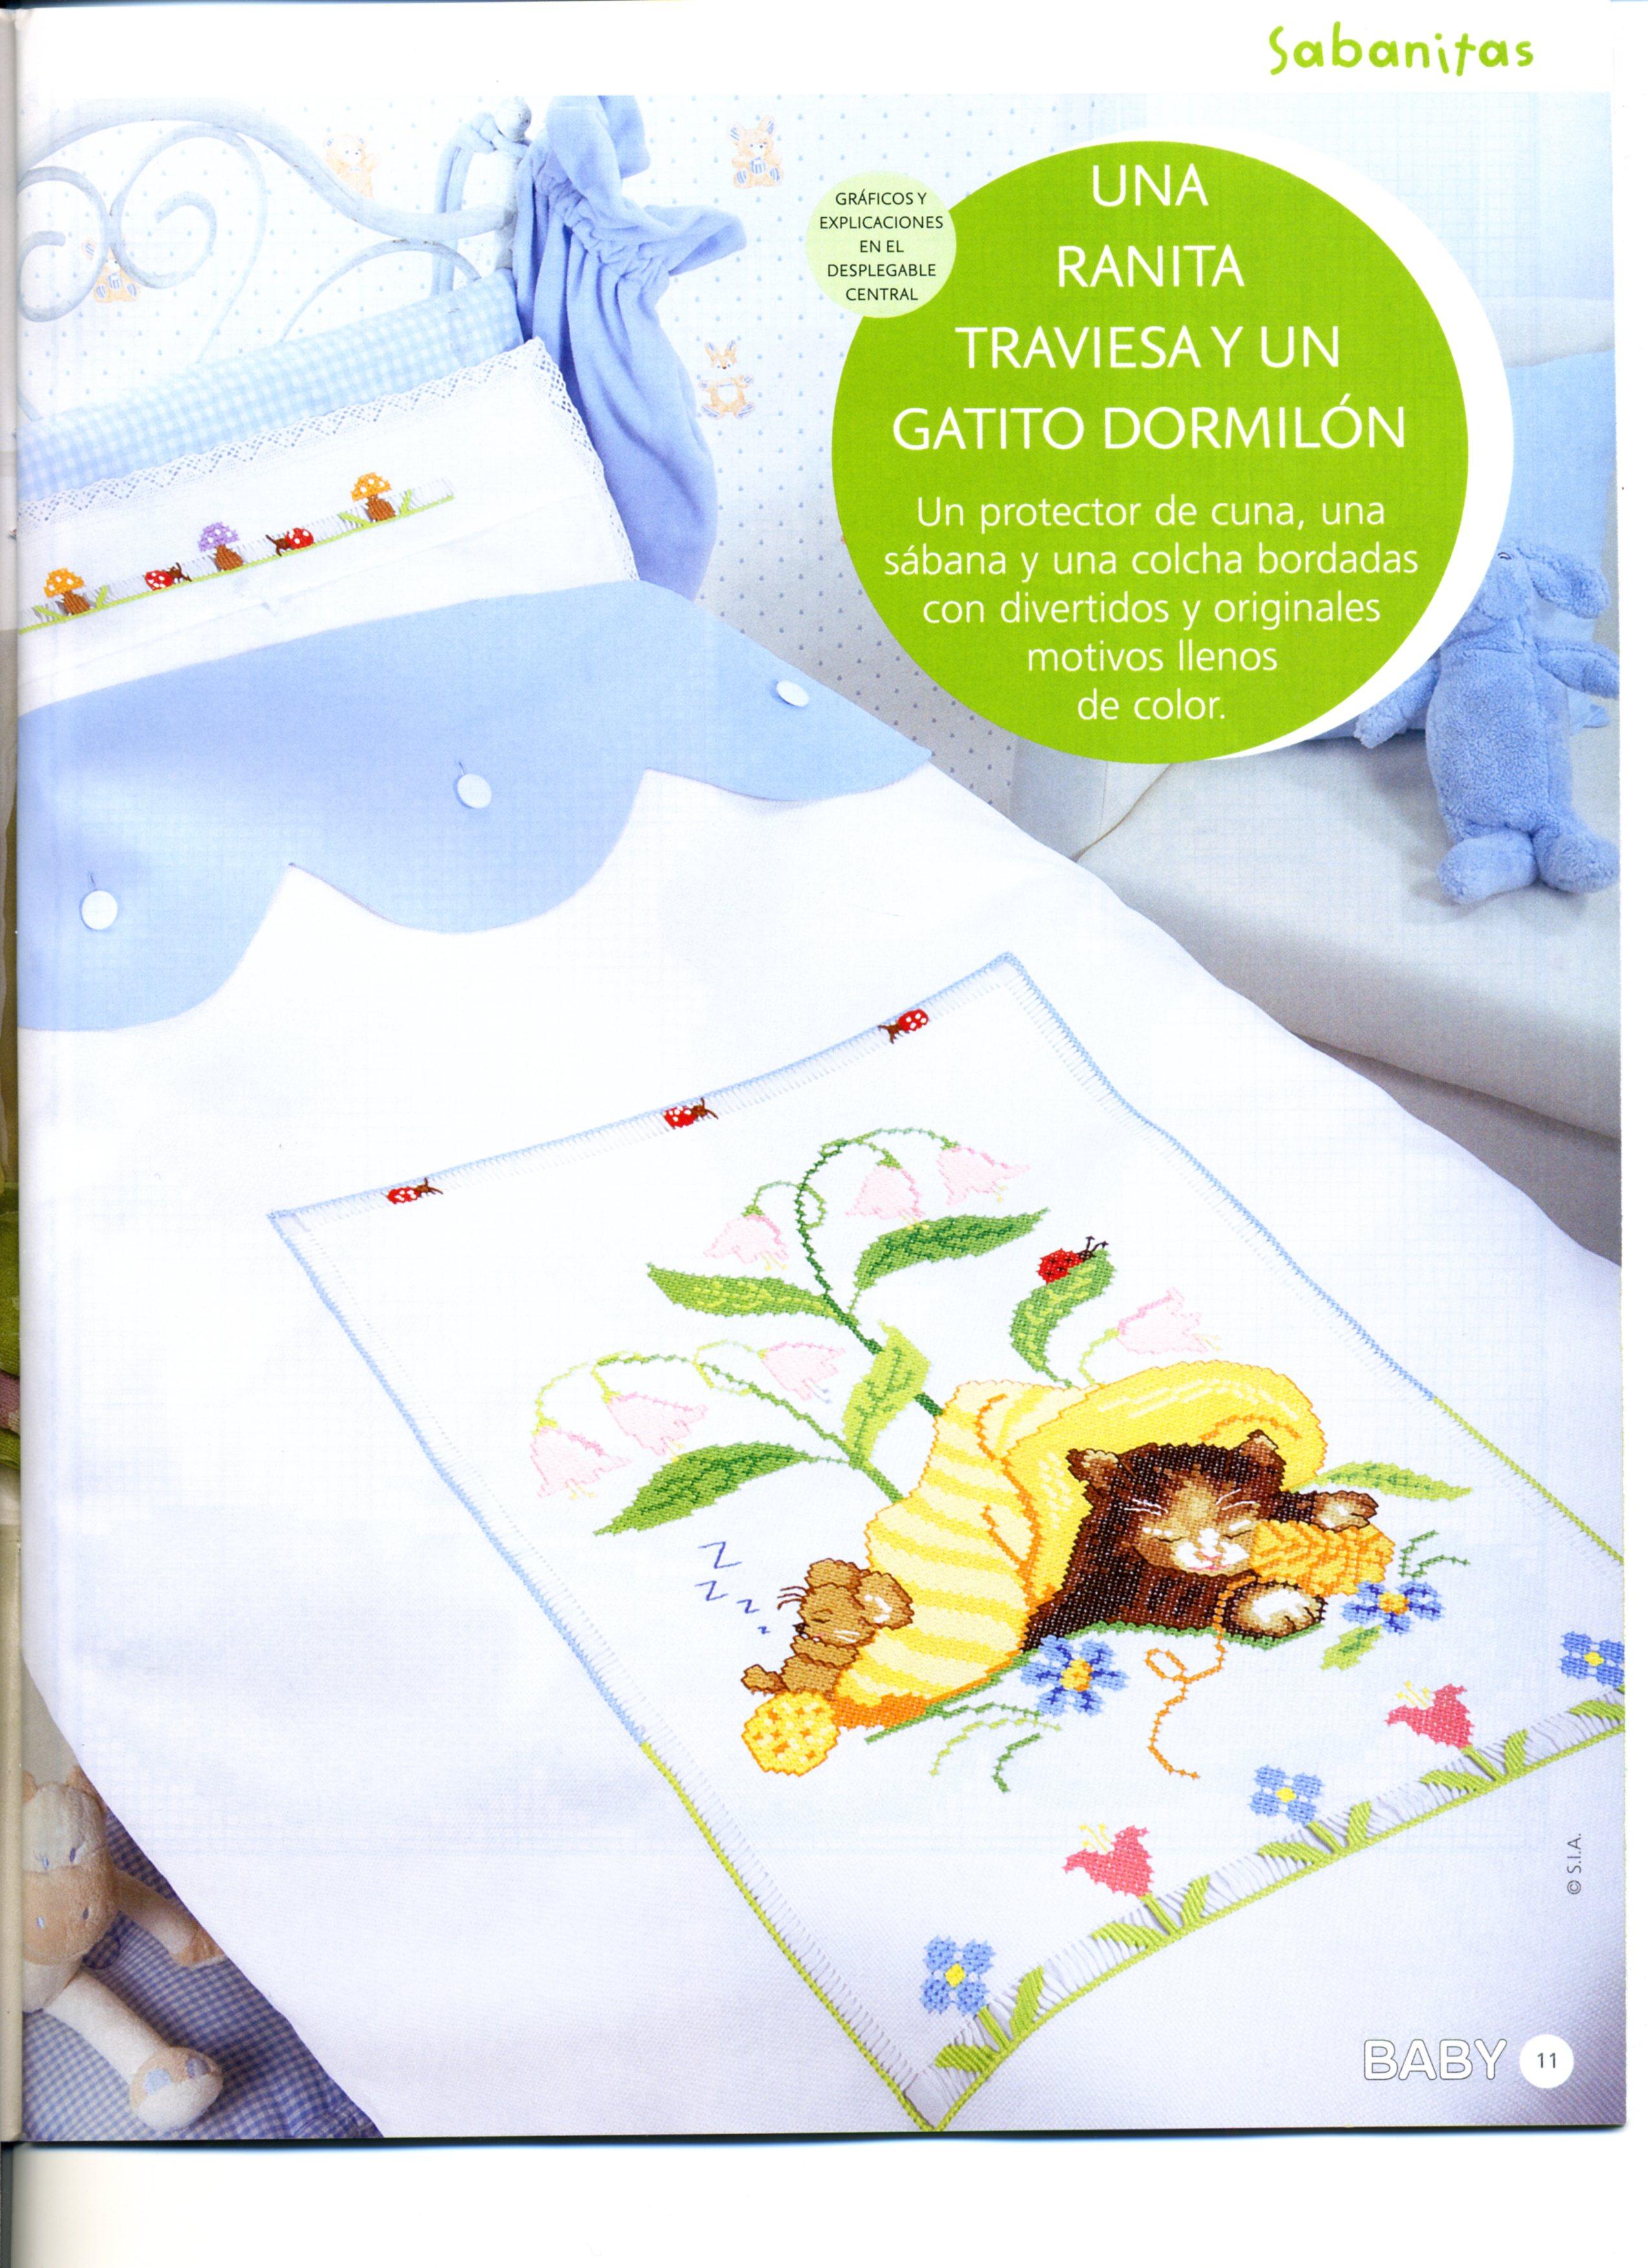 Copertina gattino 1 punto croce for Copertine punto croce bimbi schemi